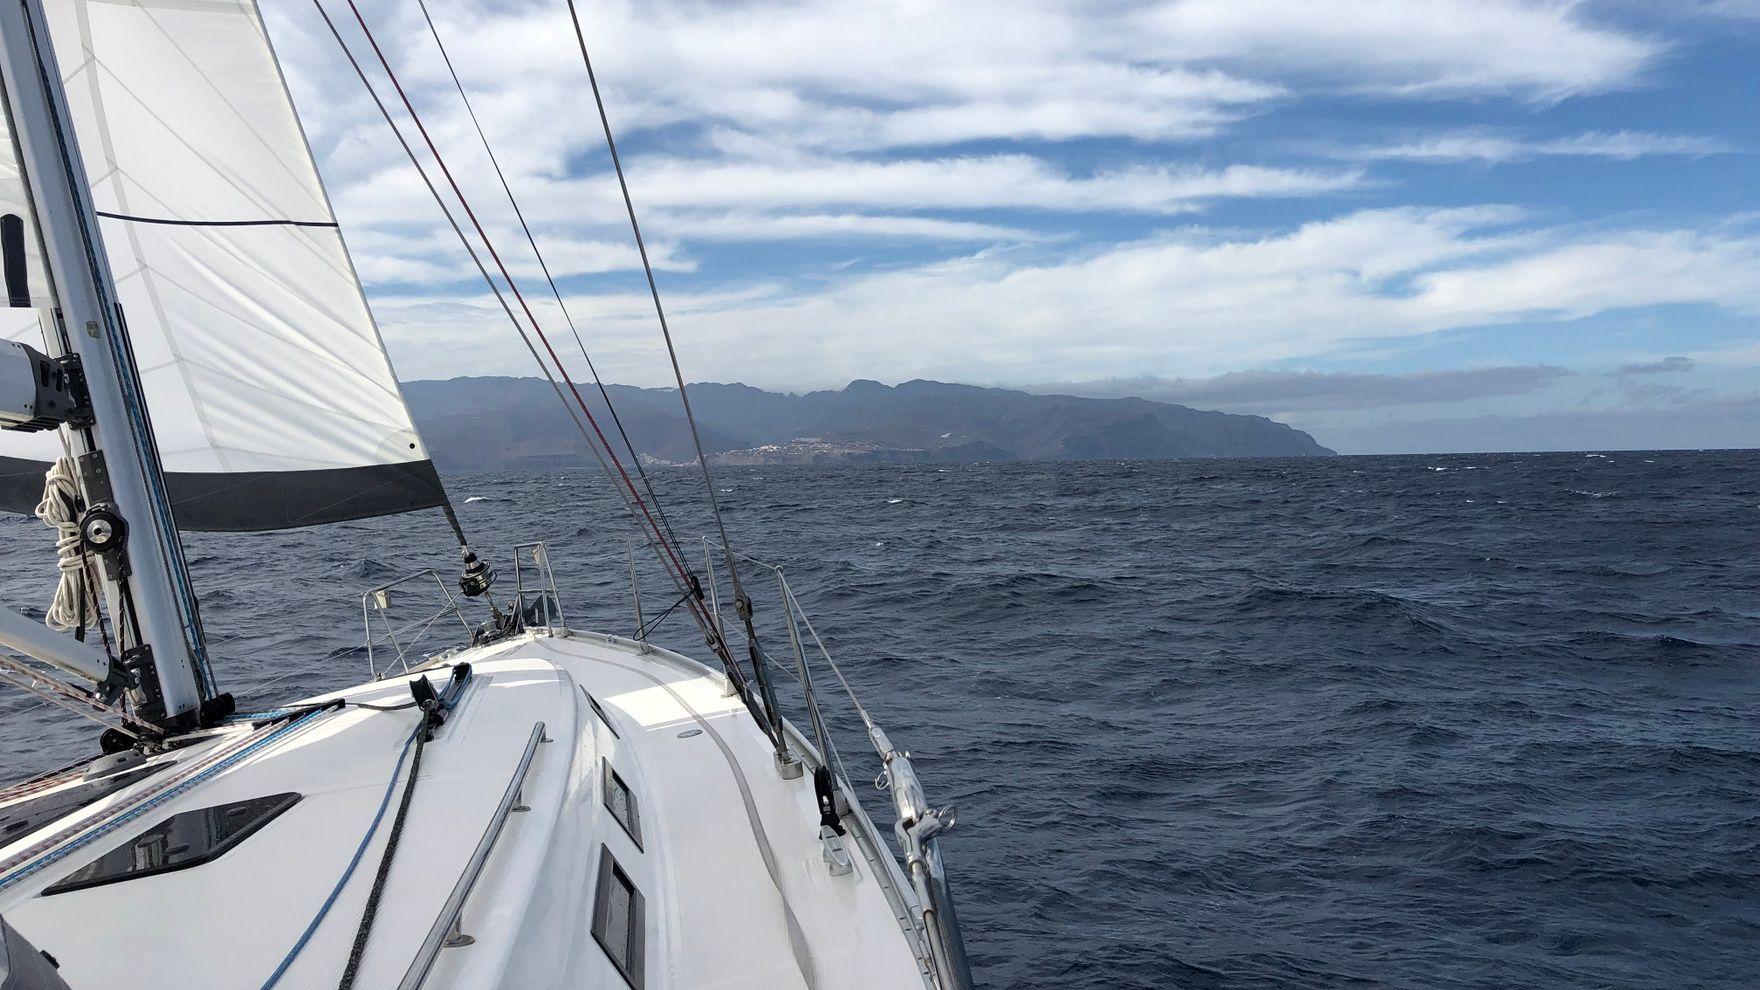 Canaries inspring, 4islands in10days: Tenerife— LaGomera— LaPalma— Hierro.310nm